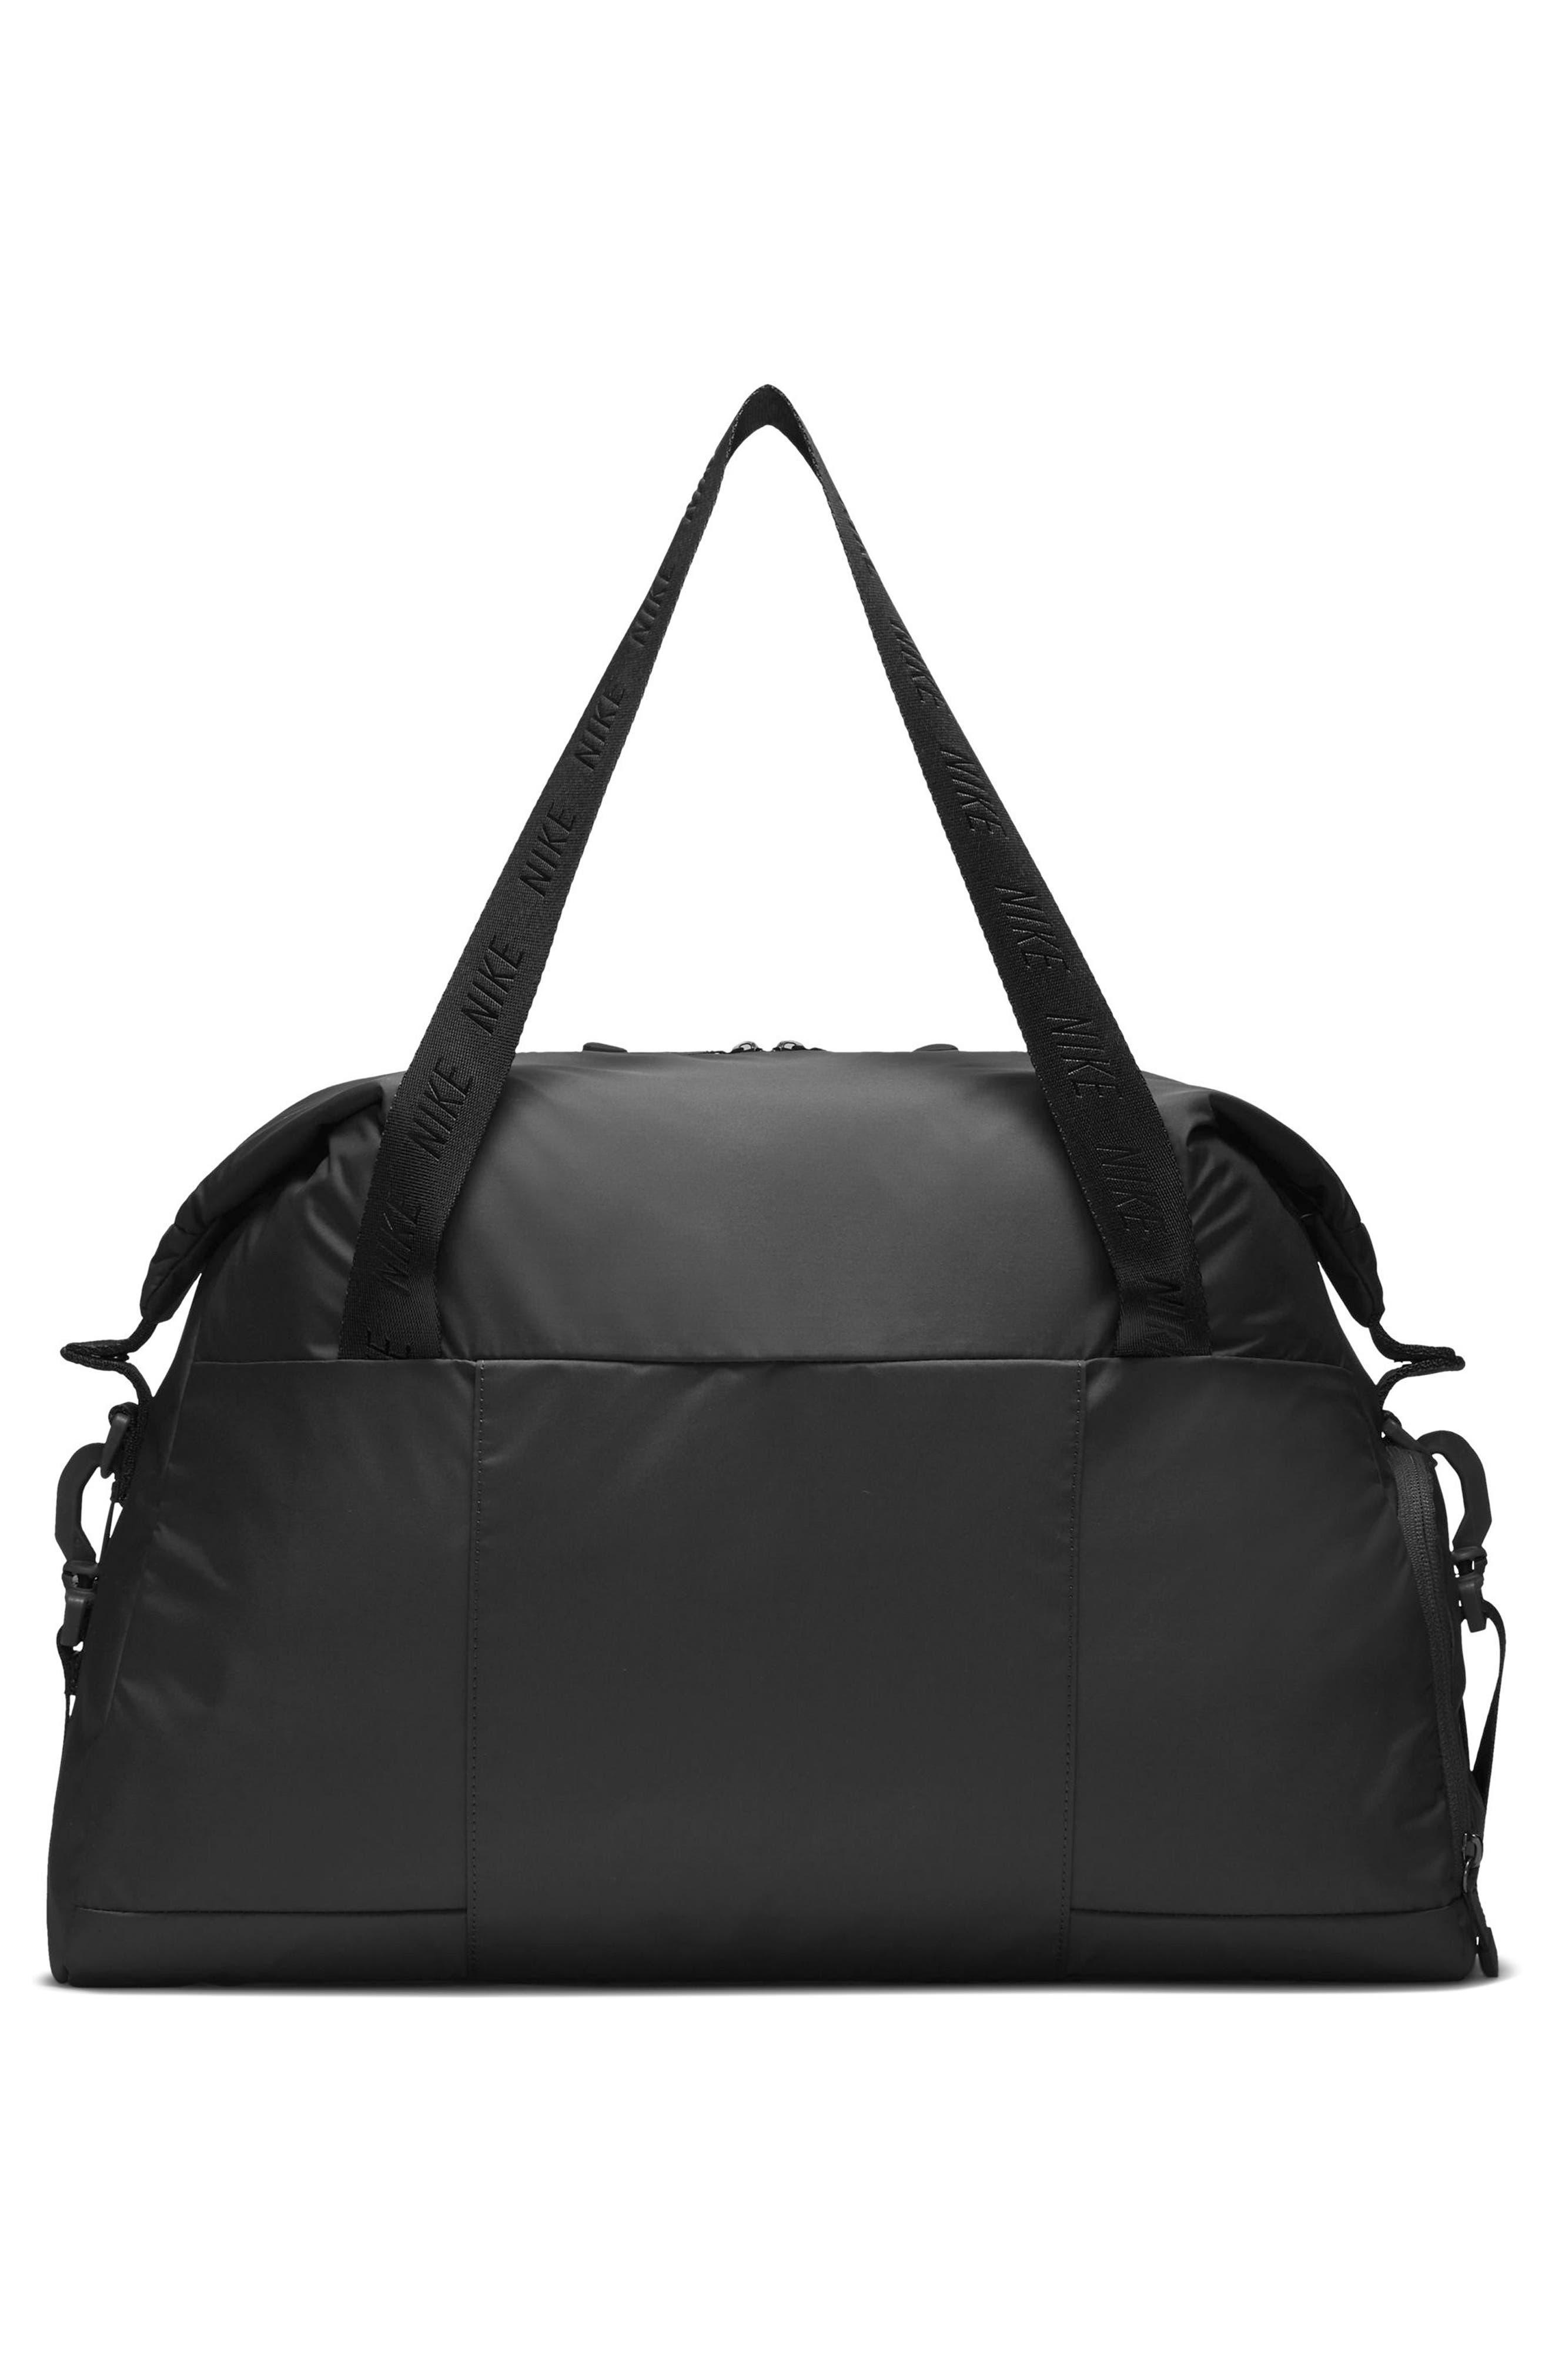 Legend Club Training Duffel Bag,                             Alternate thumbnail 2, color,                             BLACK/ STORM PINK/ BLACK